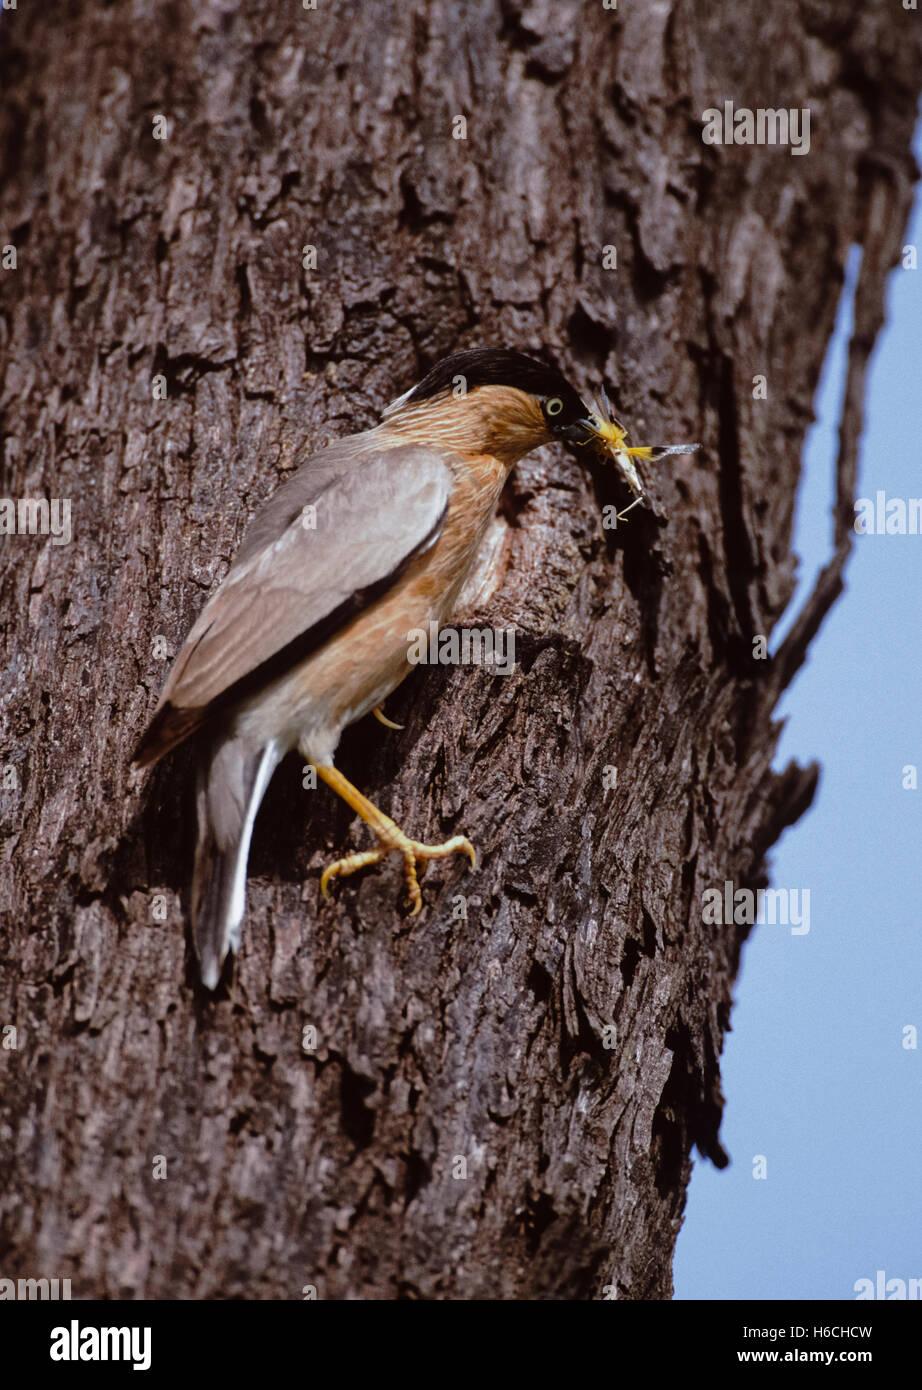 Brahminy Myna or Brahminy Starling,(Sturnus pagodarum), at nest hole with insect food, Rajasthan, India - Stock Image